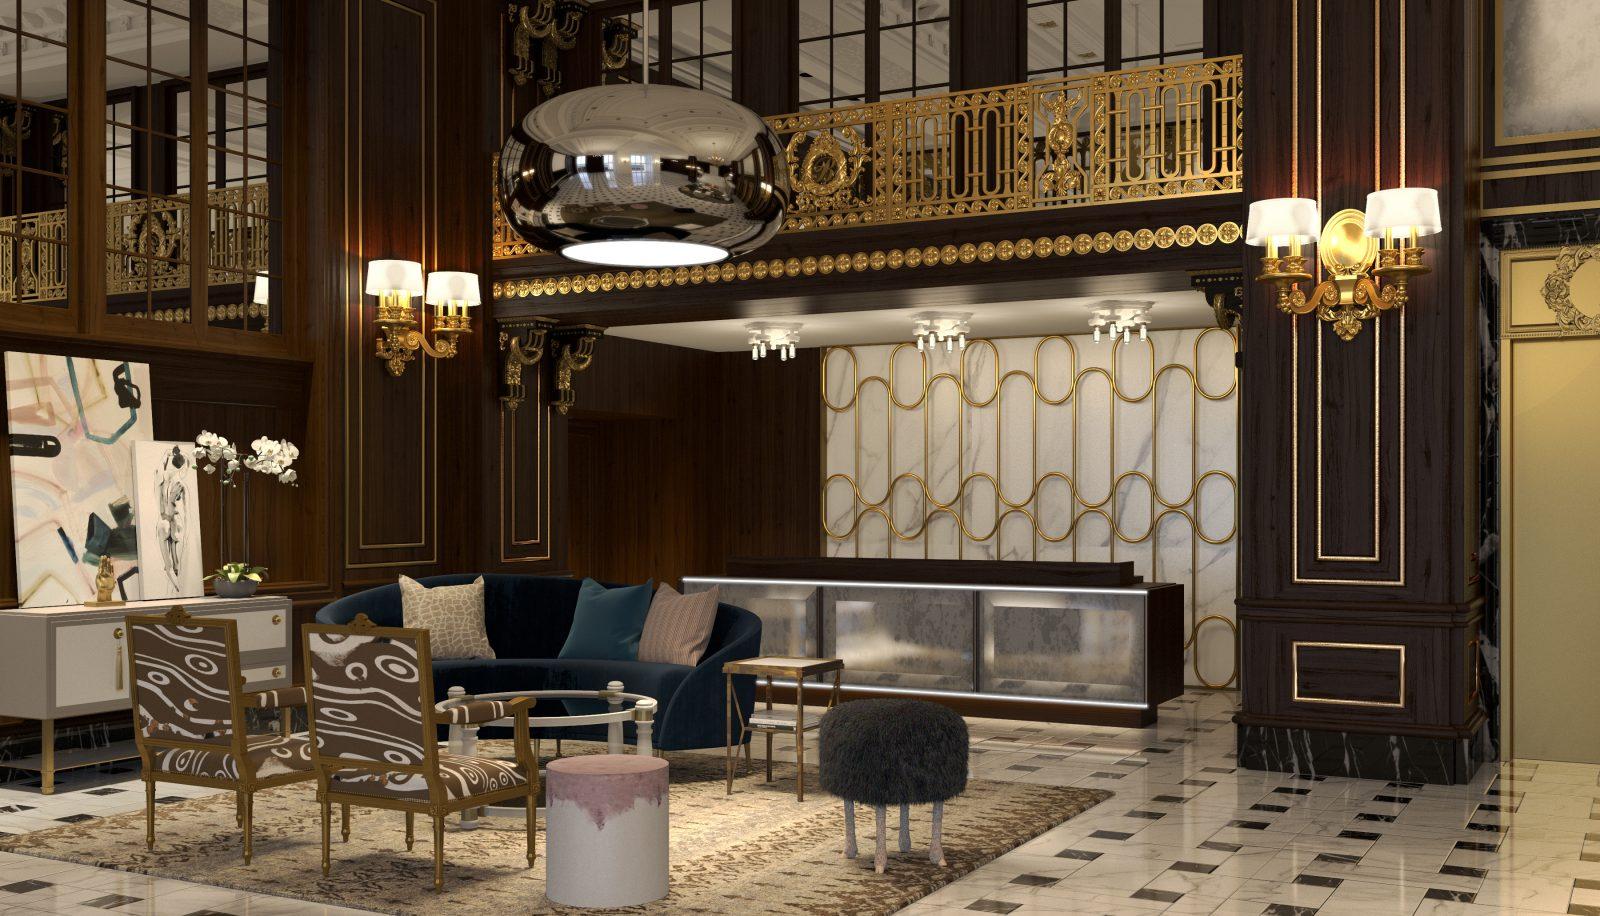 Chicago Hotels The Blackstone Hotel